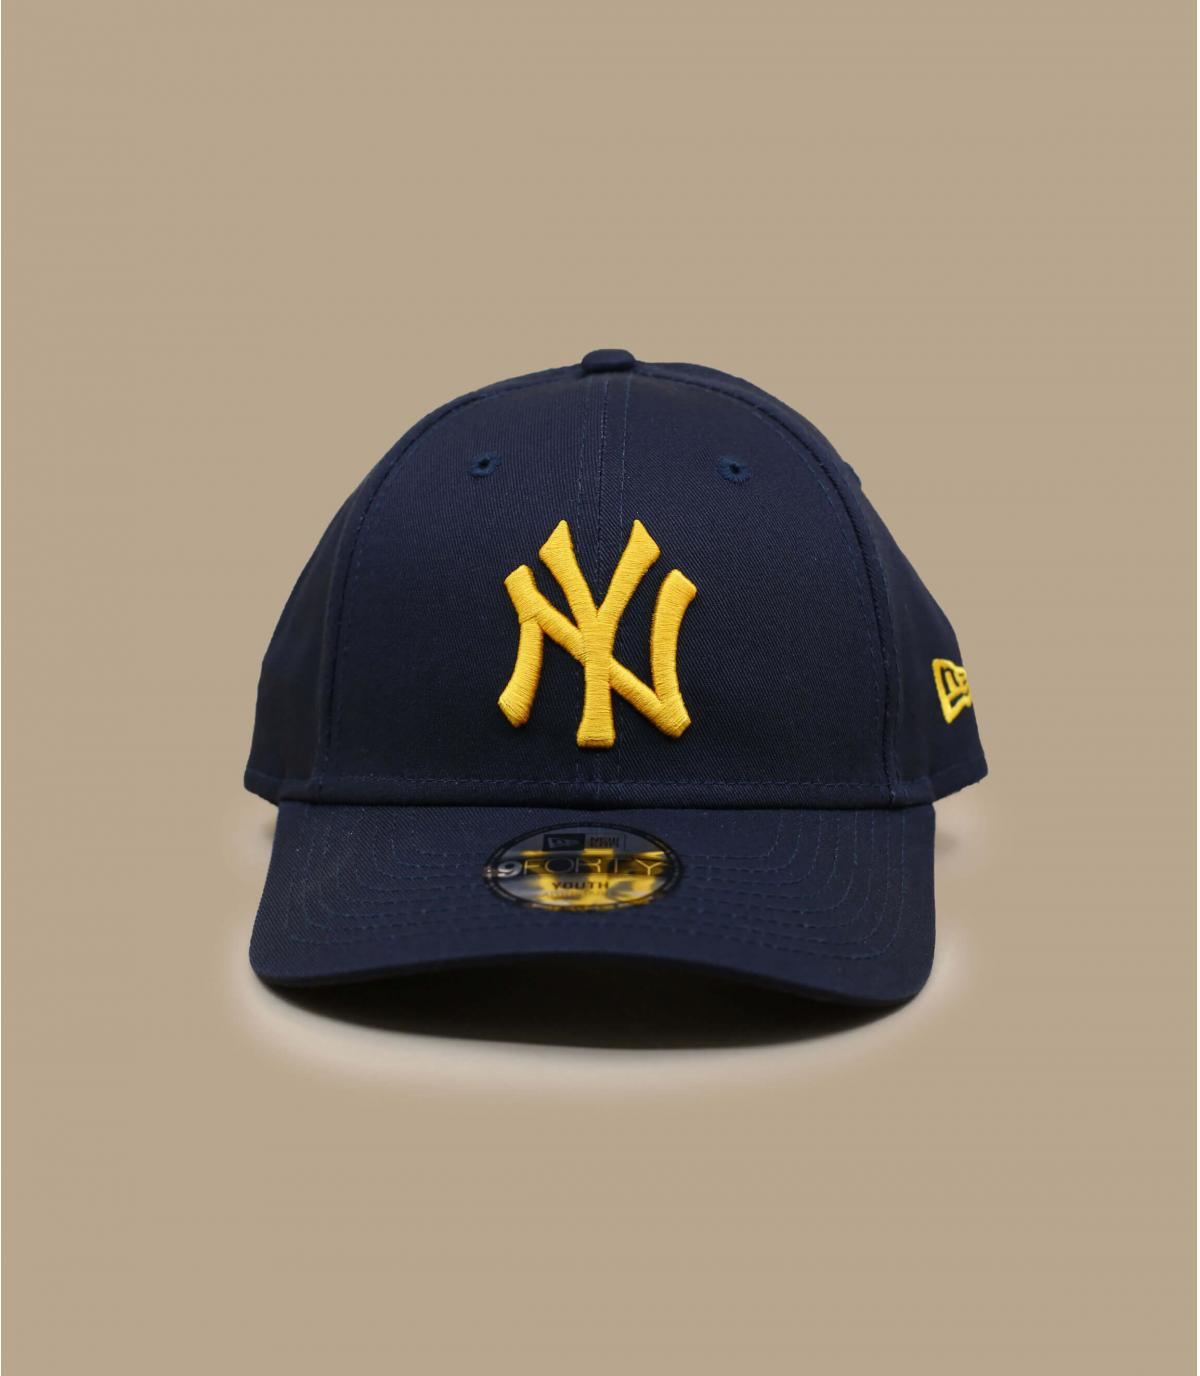 Details Kids League Ess NY 940 navy  gold - Abbildung 2